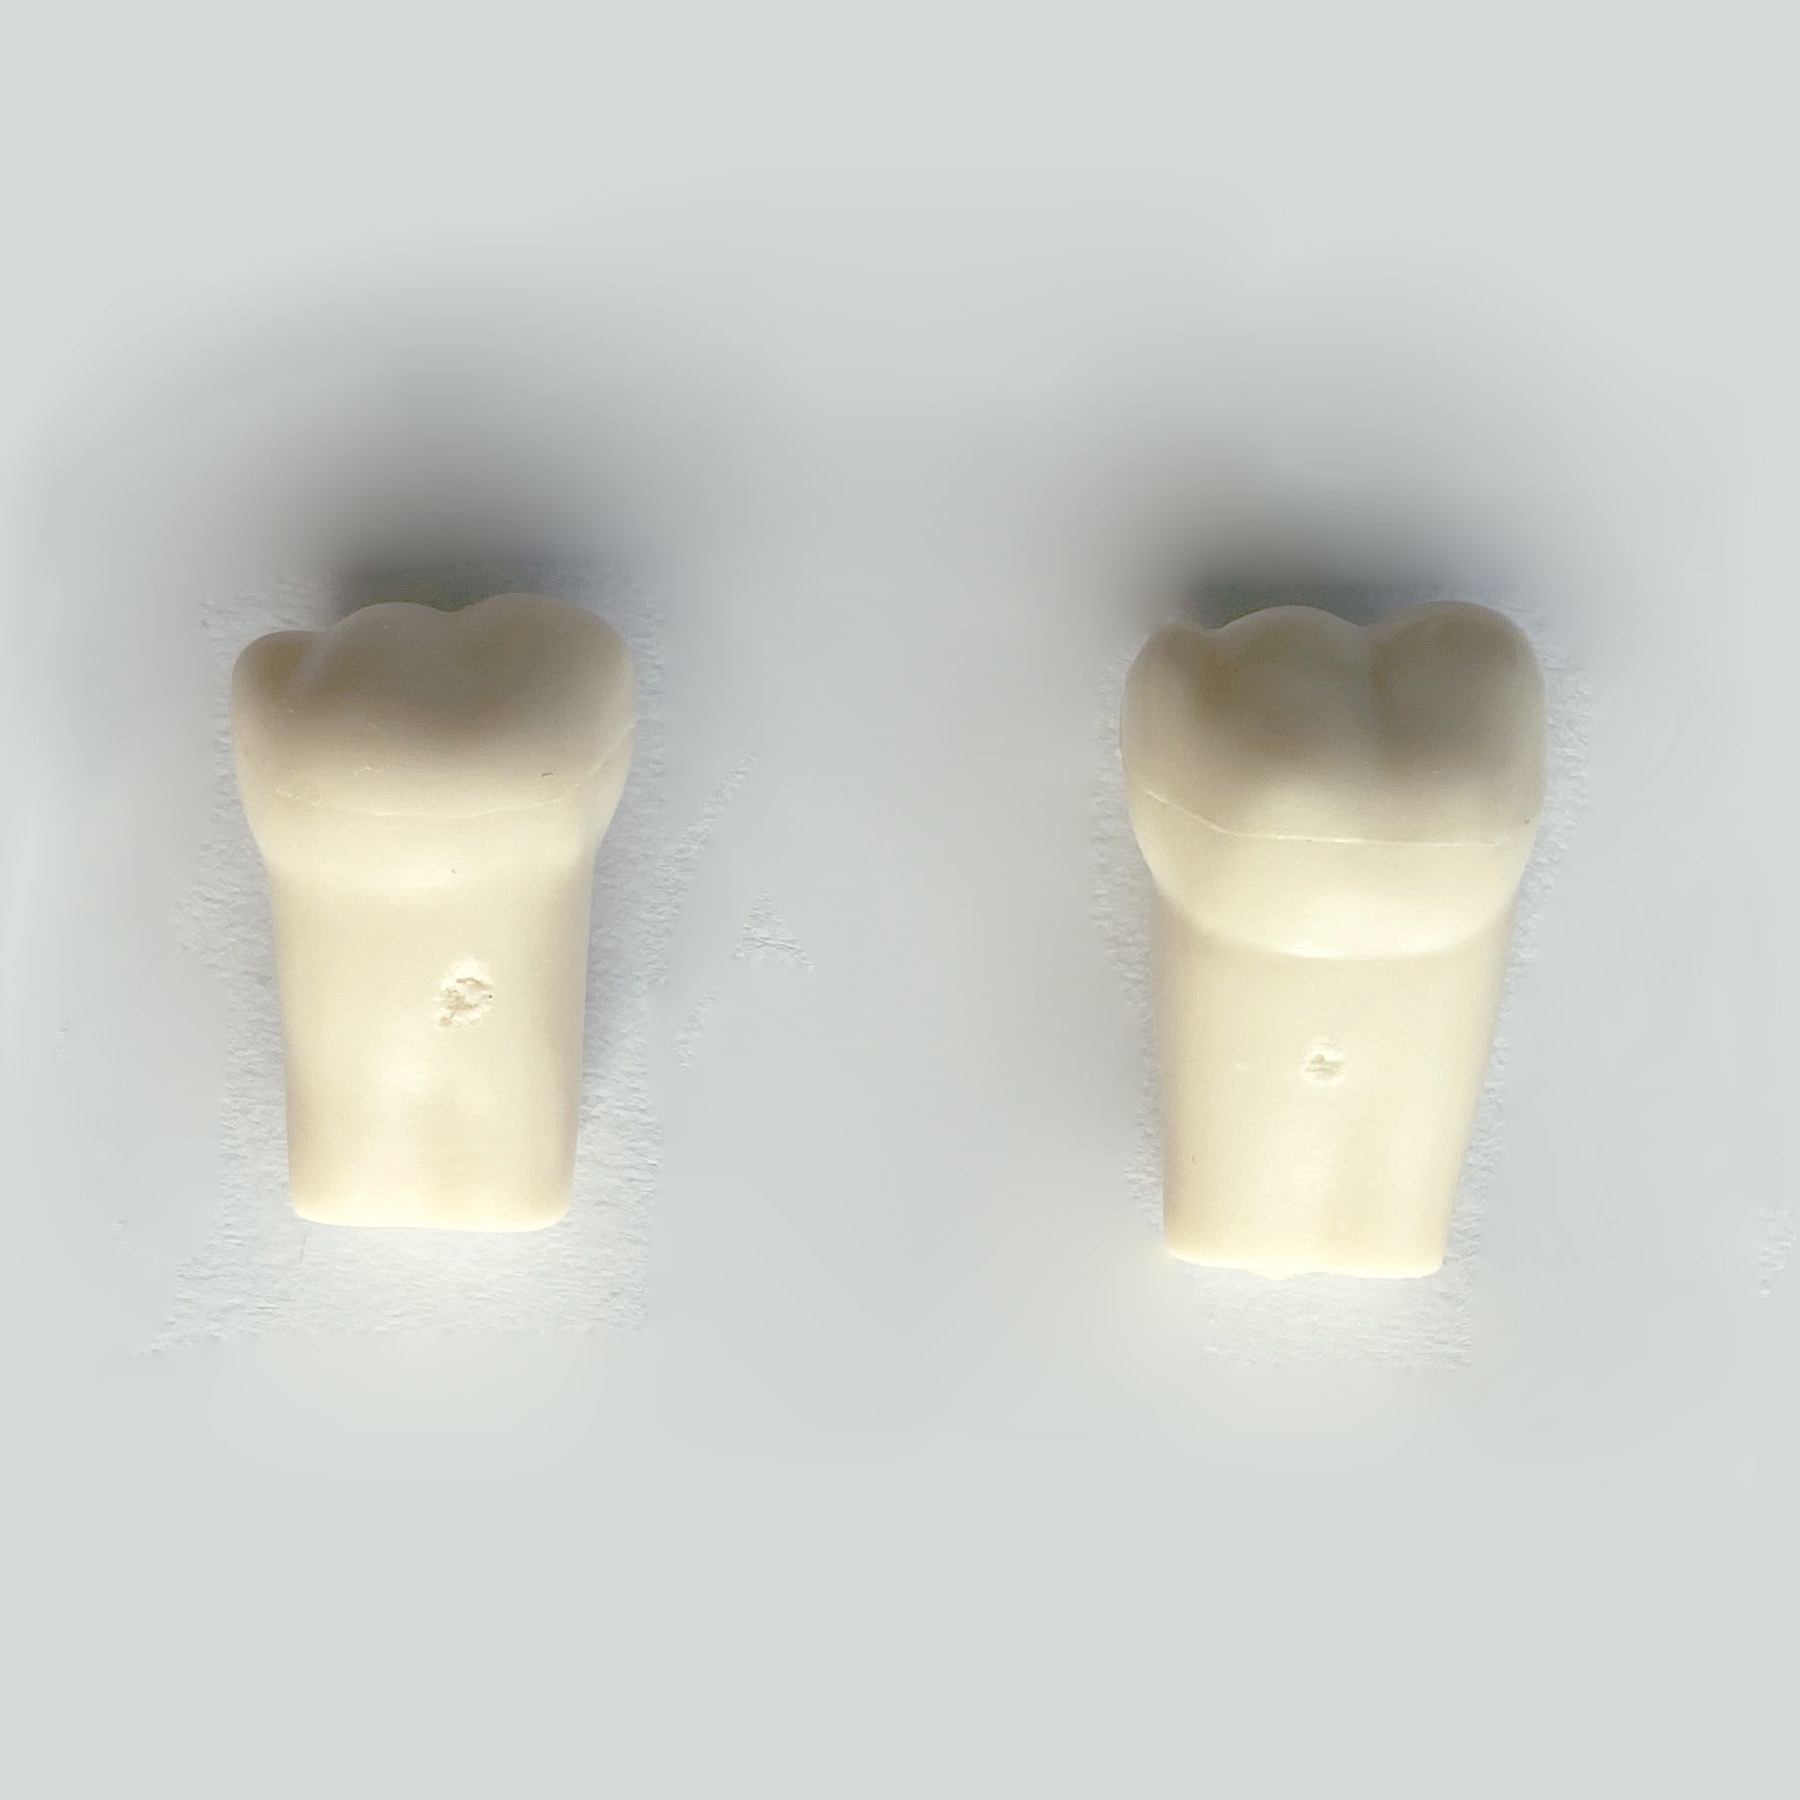 TM-D8 Dental training teeth Permanent teeth For SF Study Model